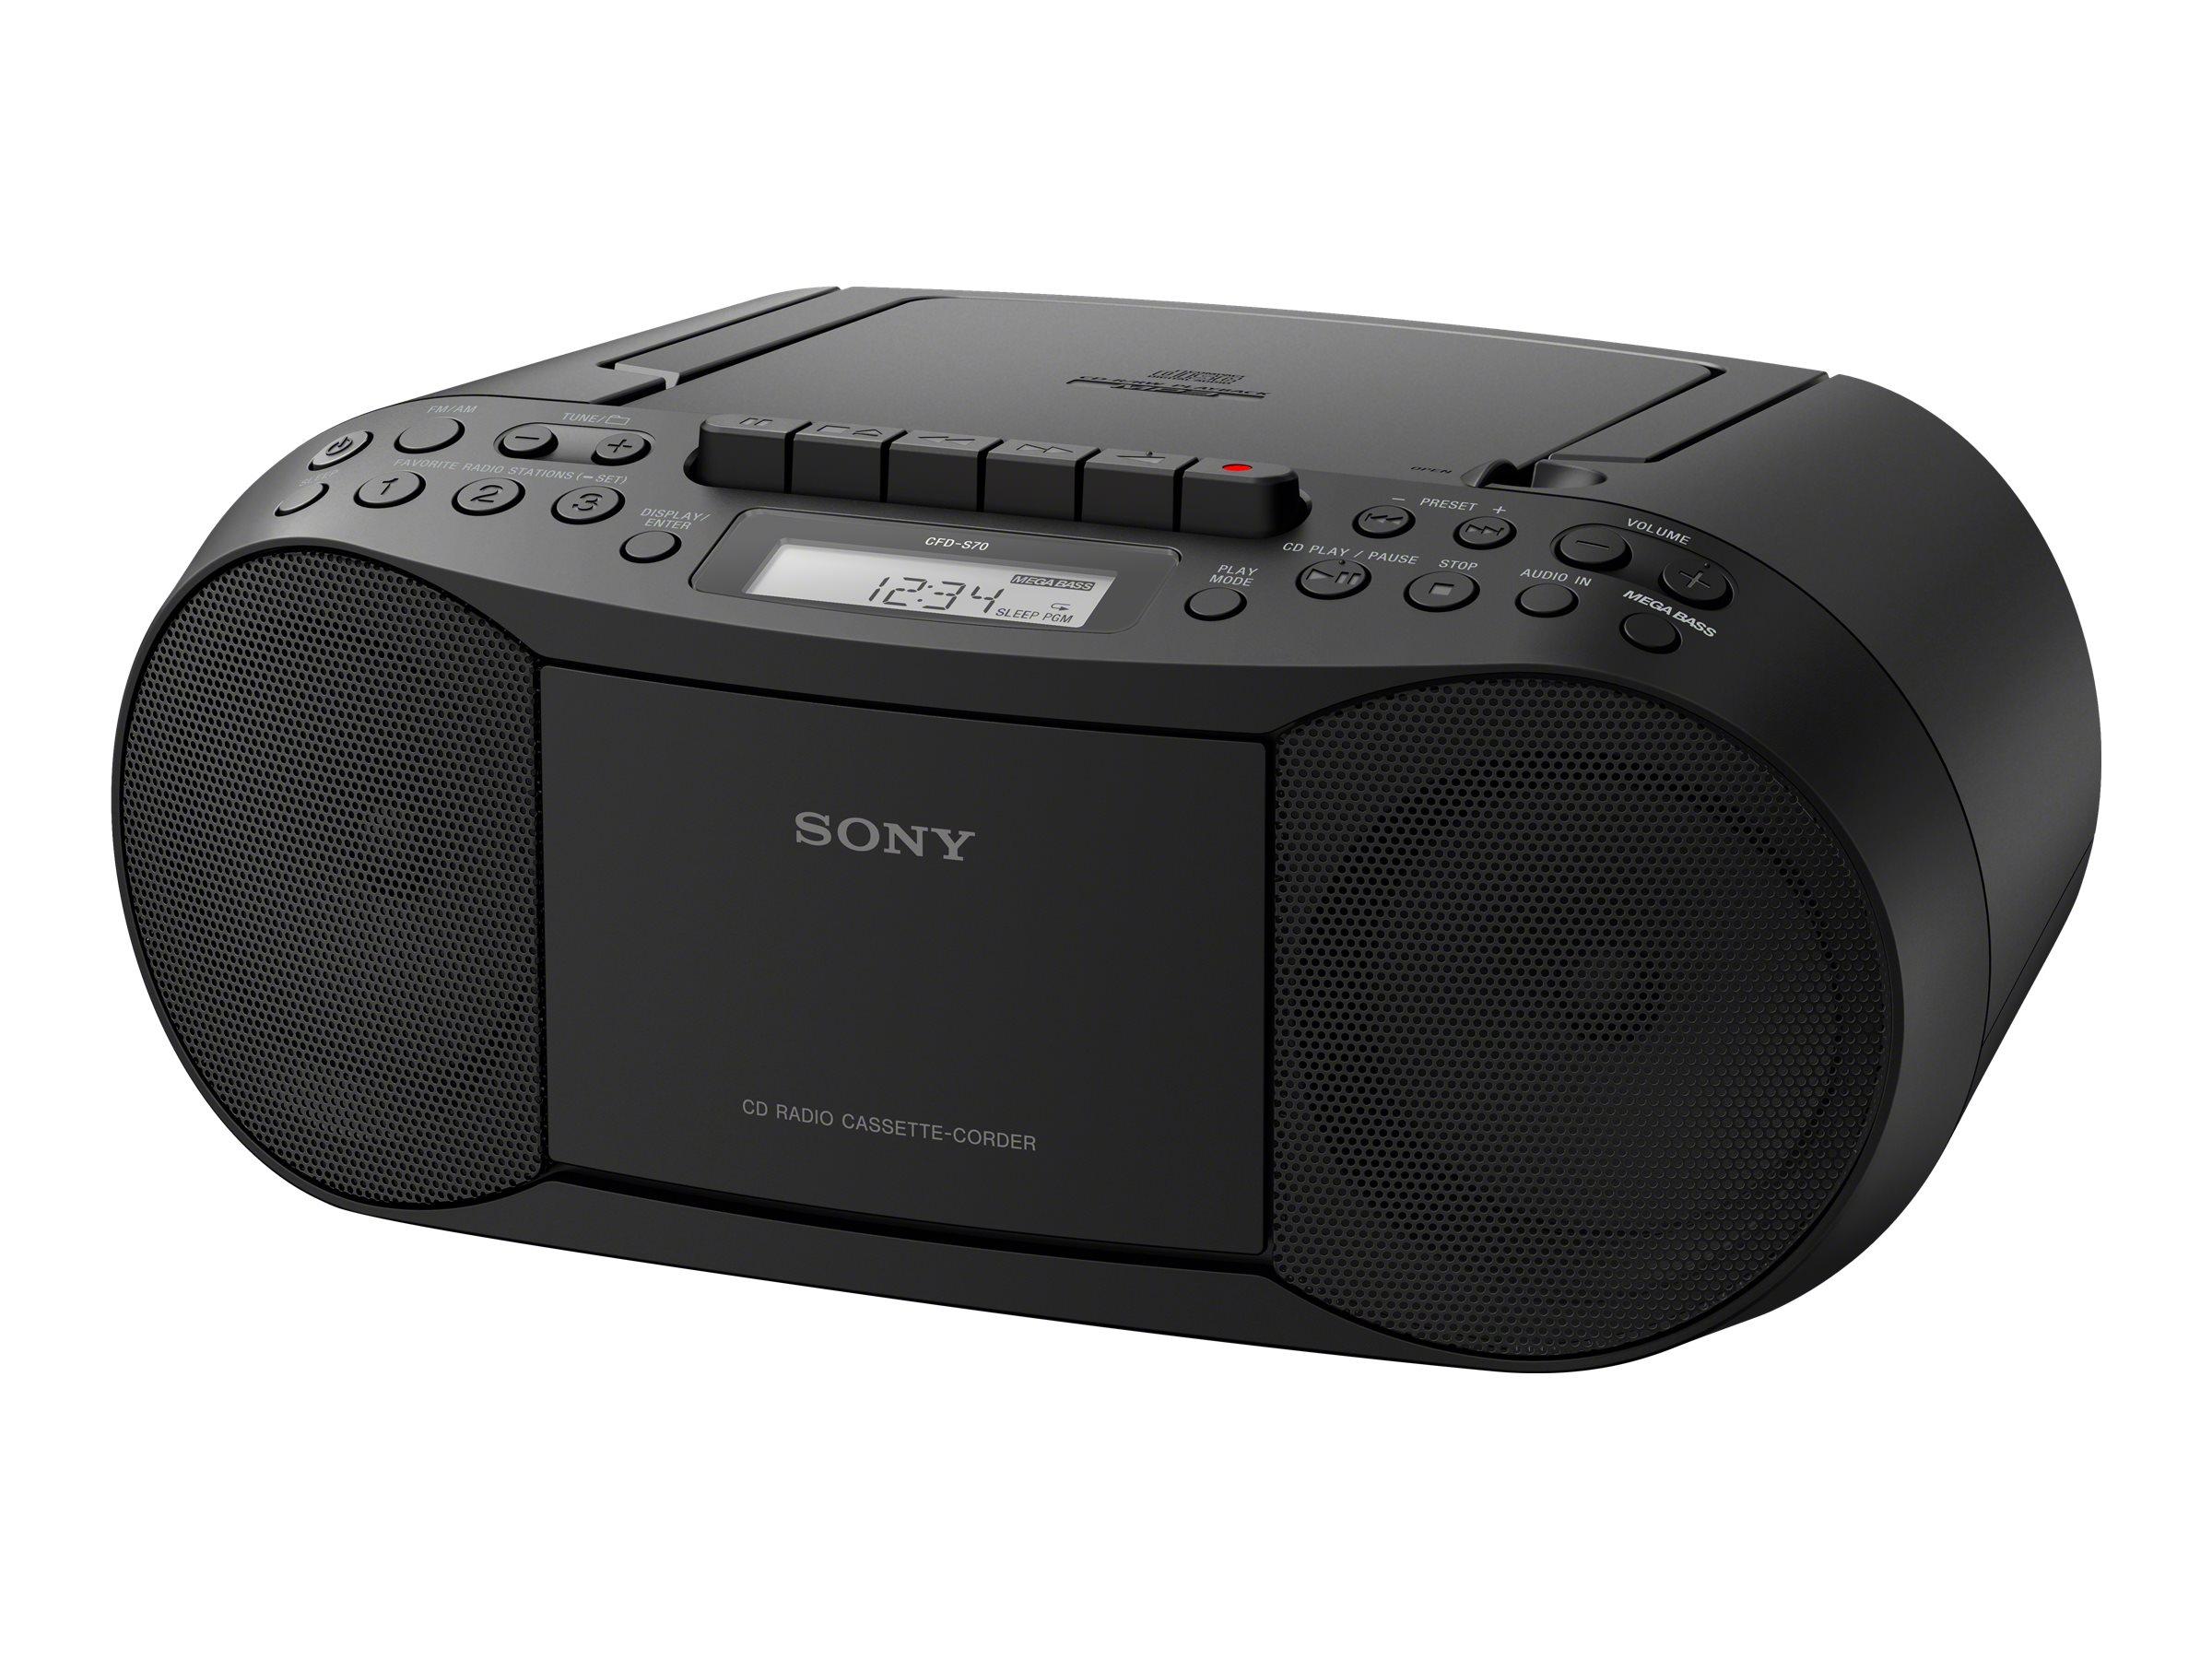 Voyage Avec Leclerc Élégant Radio Cd sony Radio Cd Noire Cfd S70w